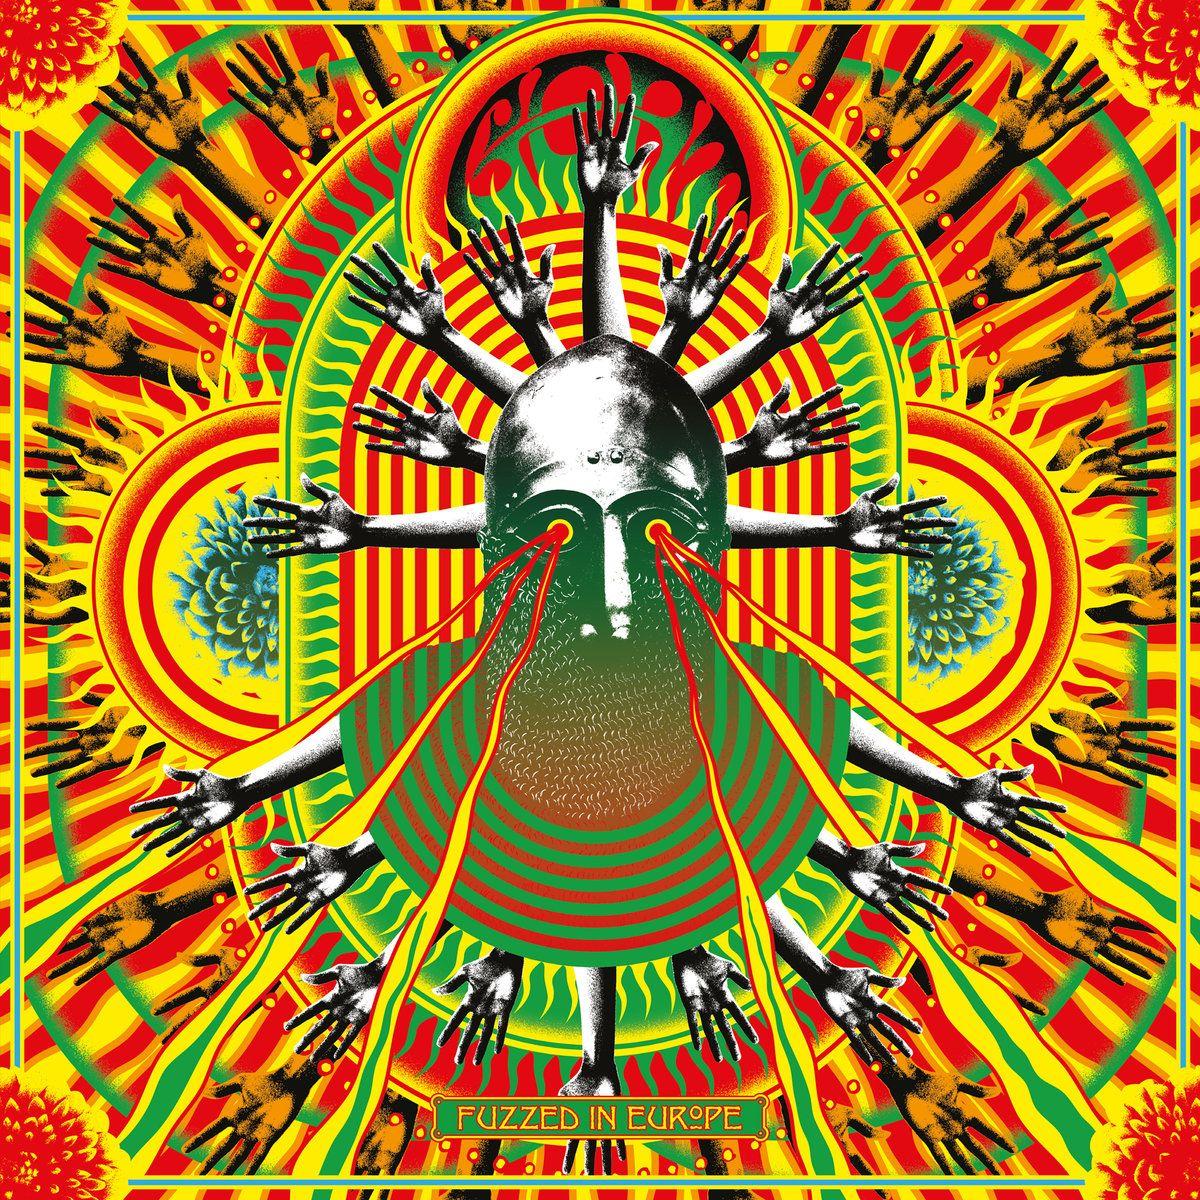 Fuzzed In Europe Goat Album Cover Art Cover Art Europe